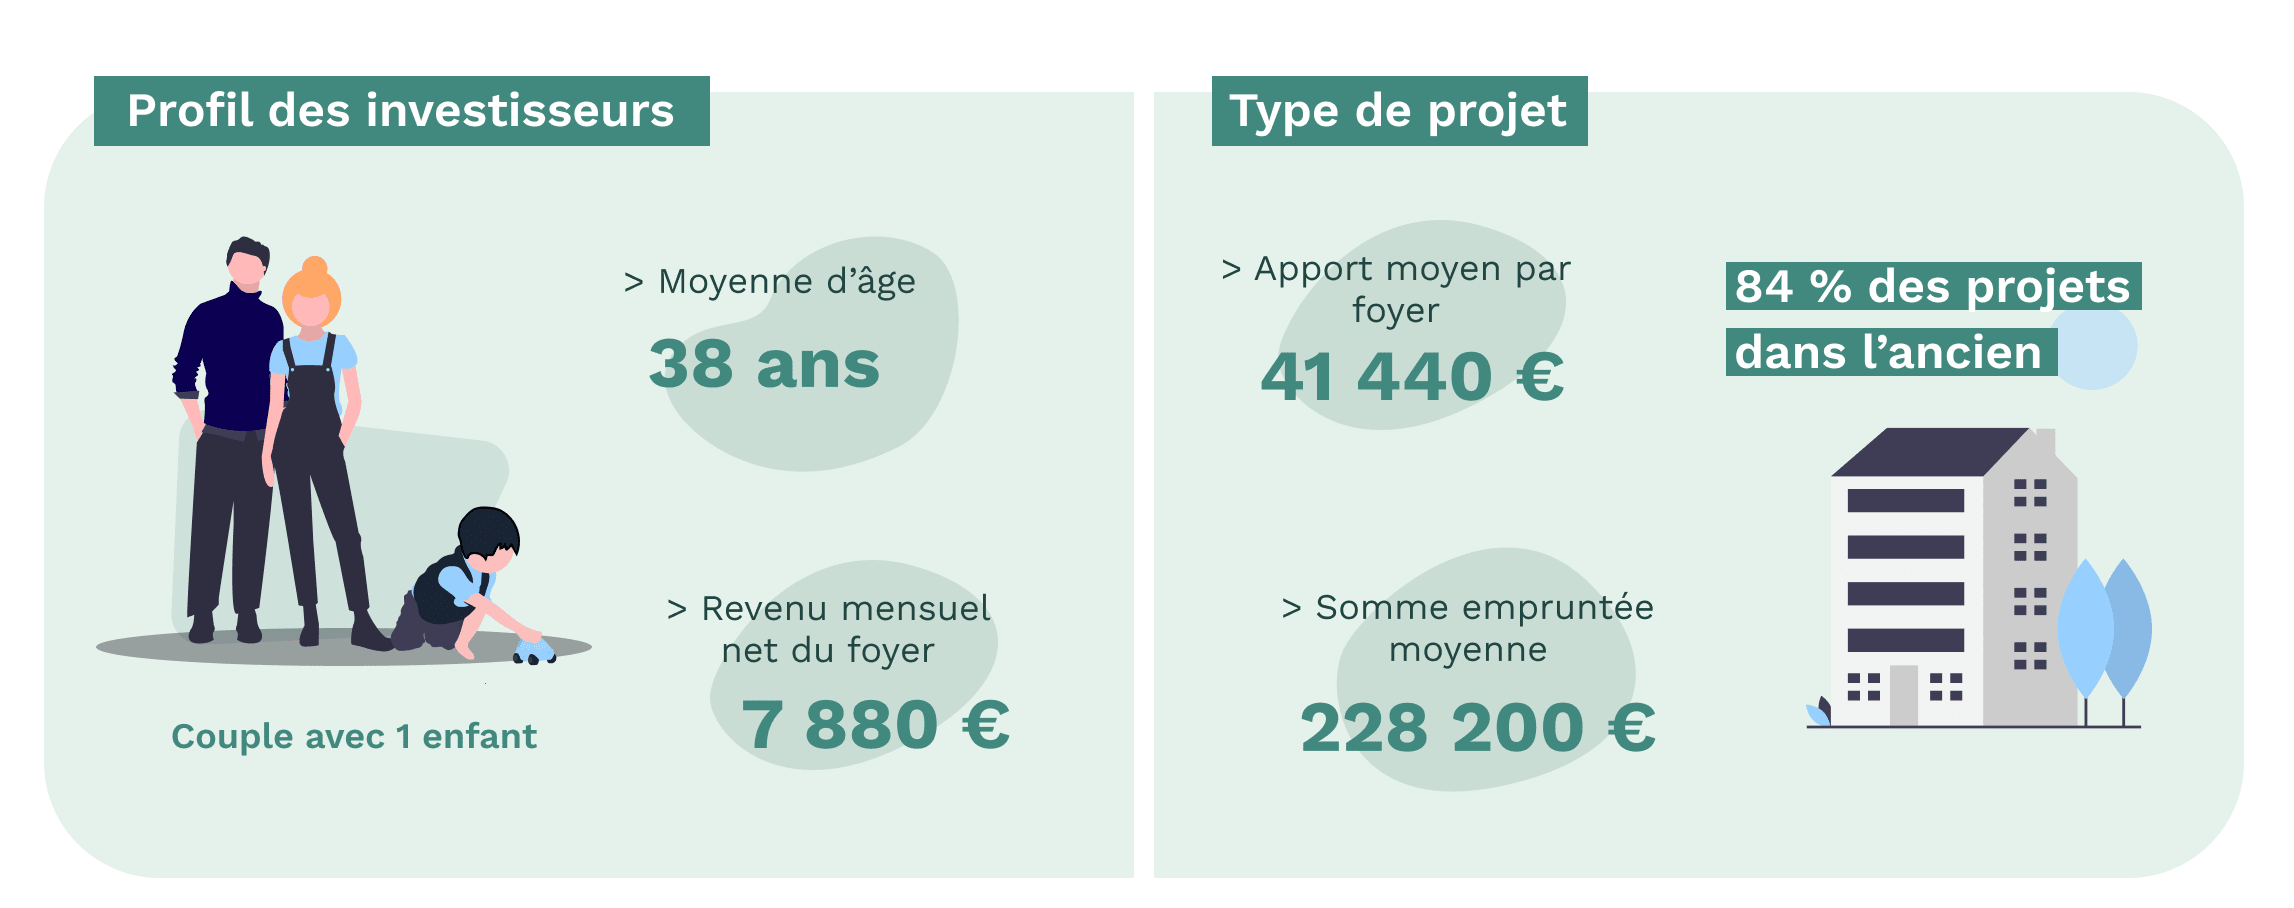 website/content/10-villes-preferees-investisseurs-immobilier-2020-1